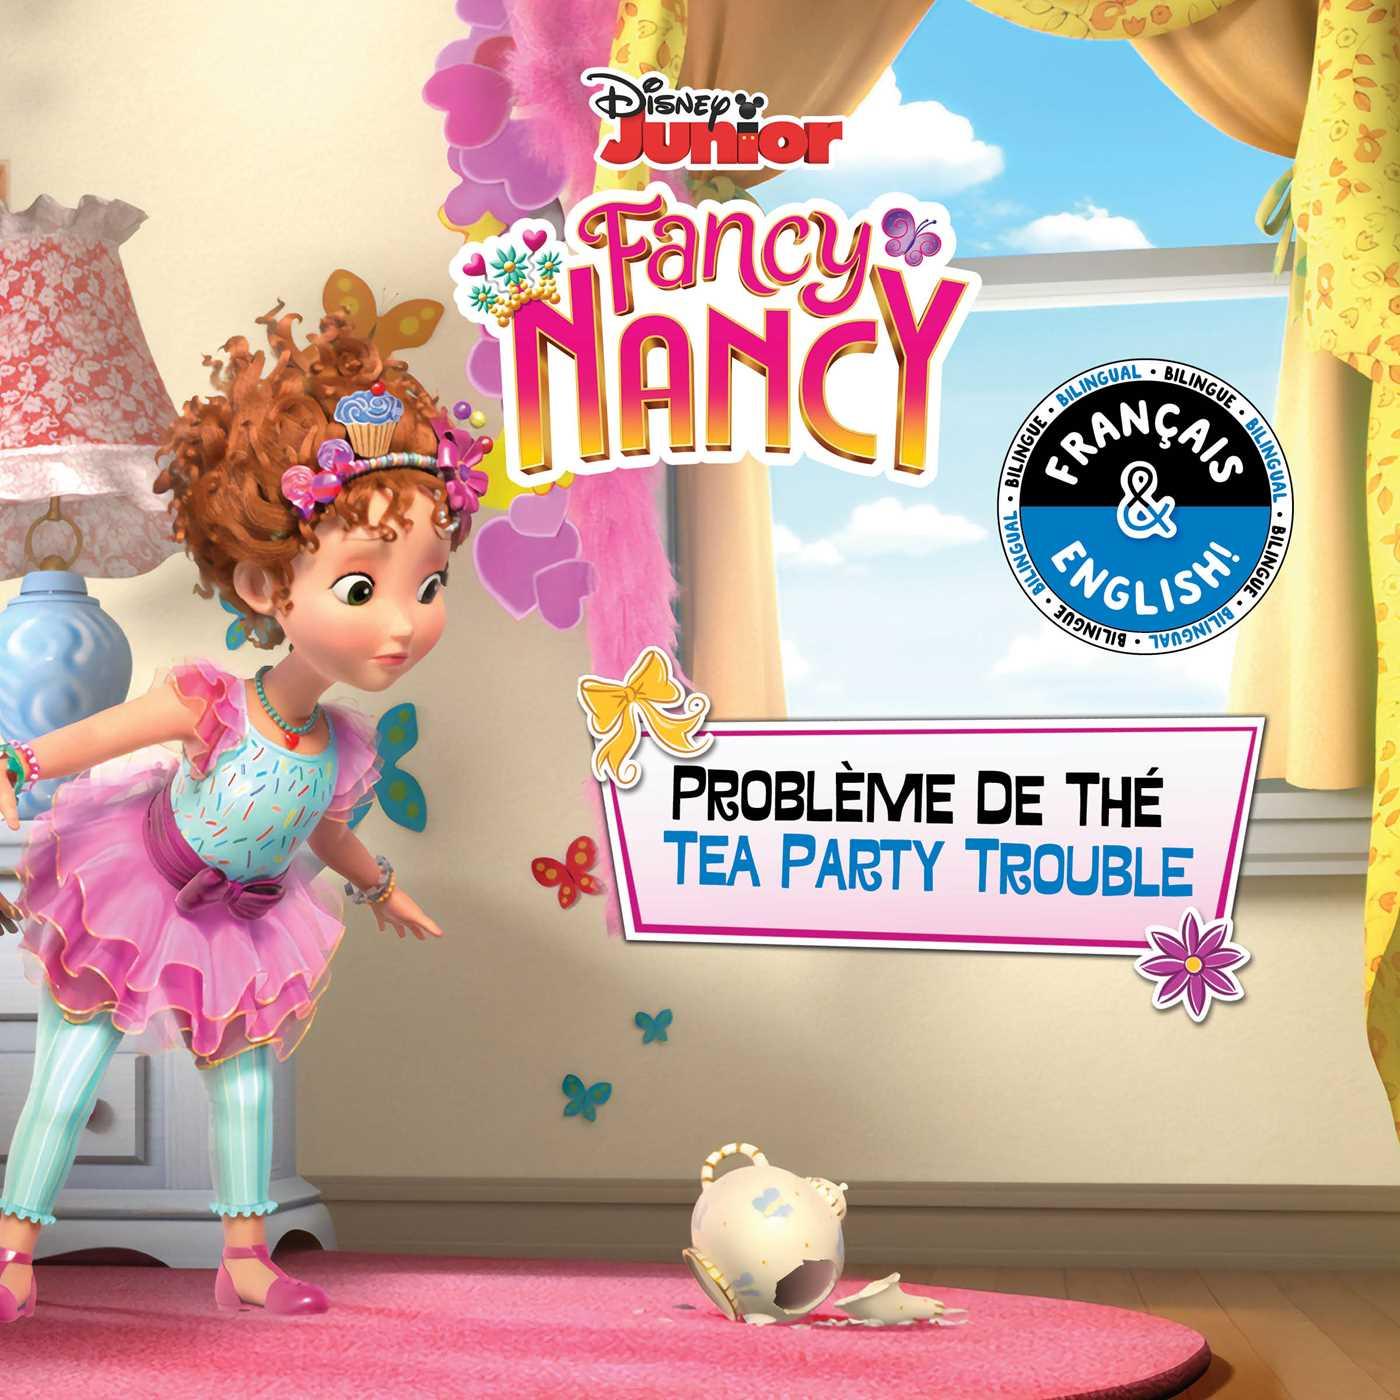 Tea party trouble probleme de the english french disney fancy nancy 9781499807882 hr